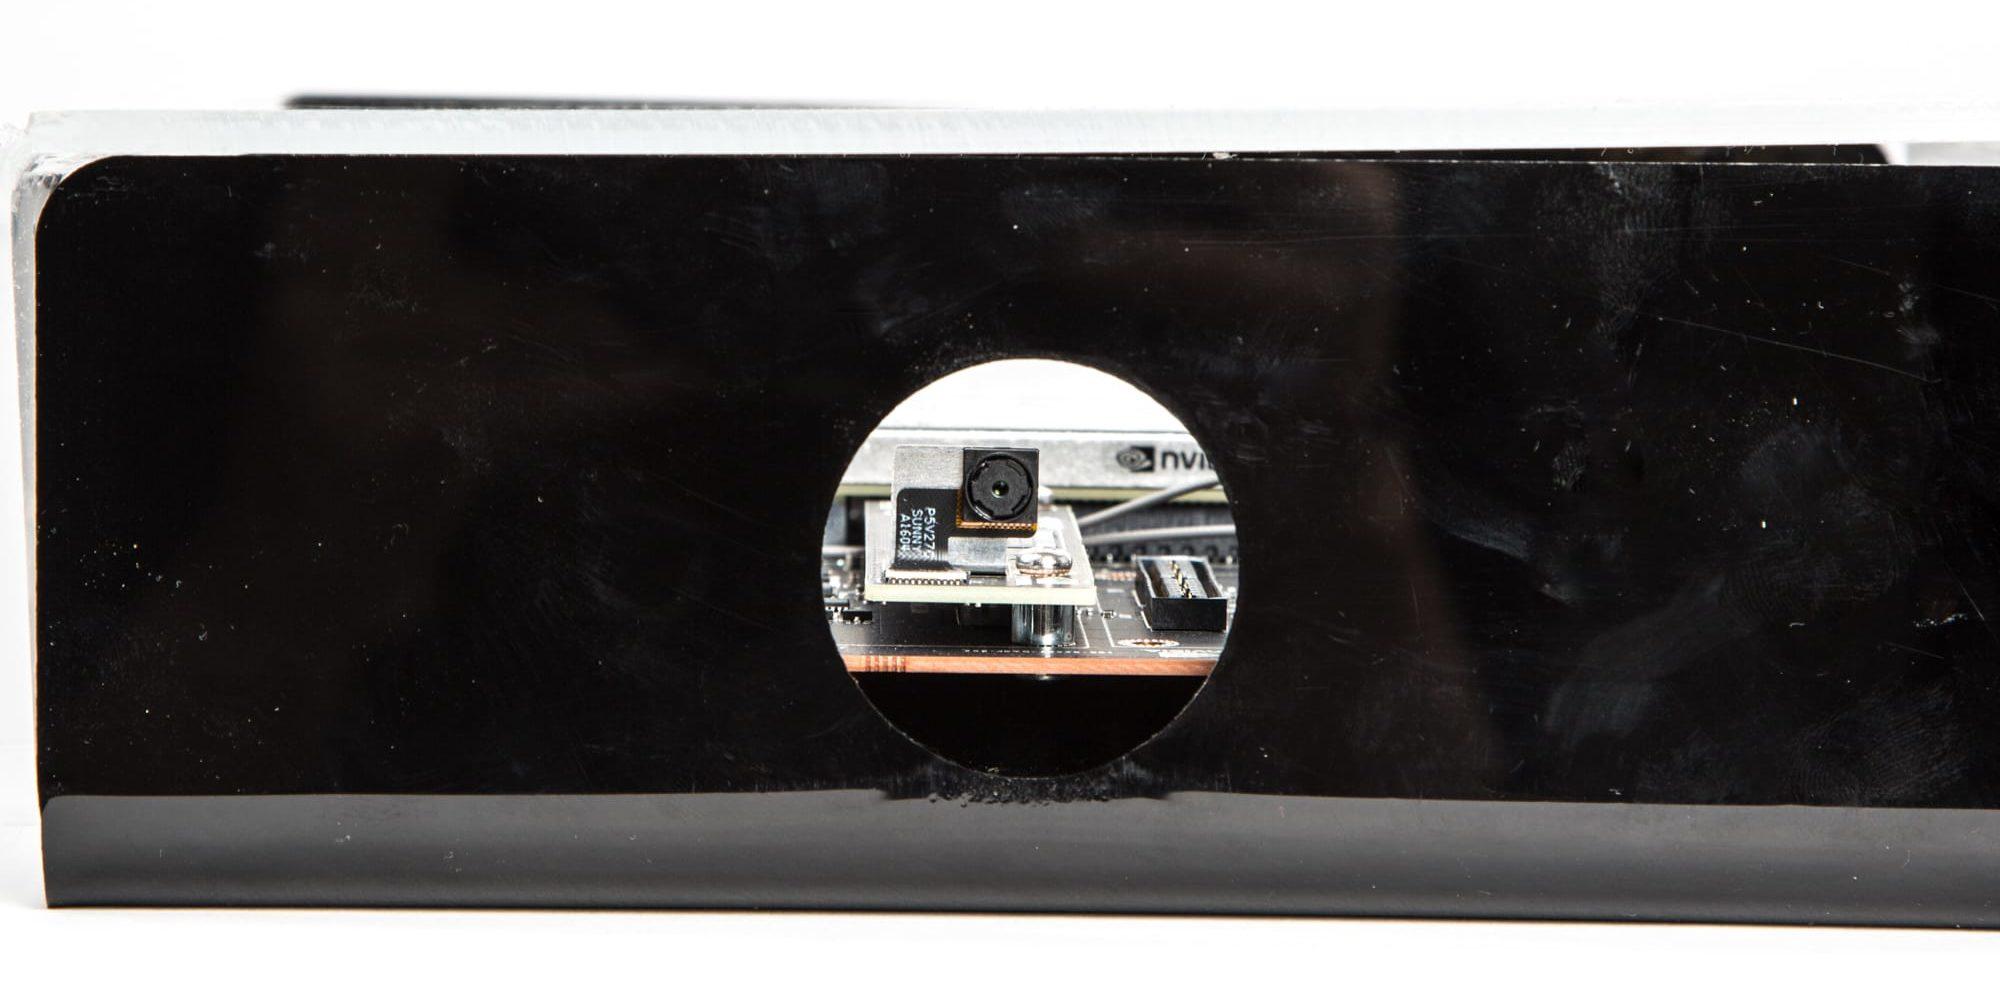 Nvidia Jetson TX1 Cat Spotter and Laser Teaser | Make: